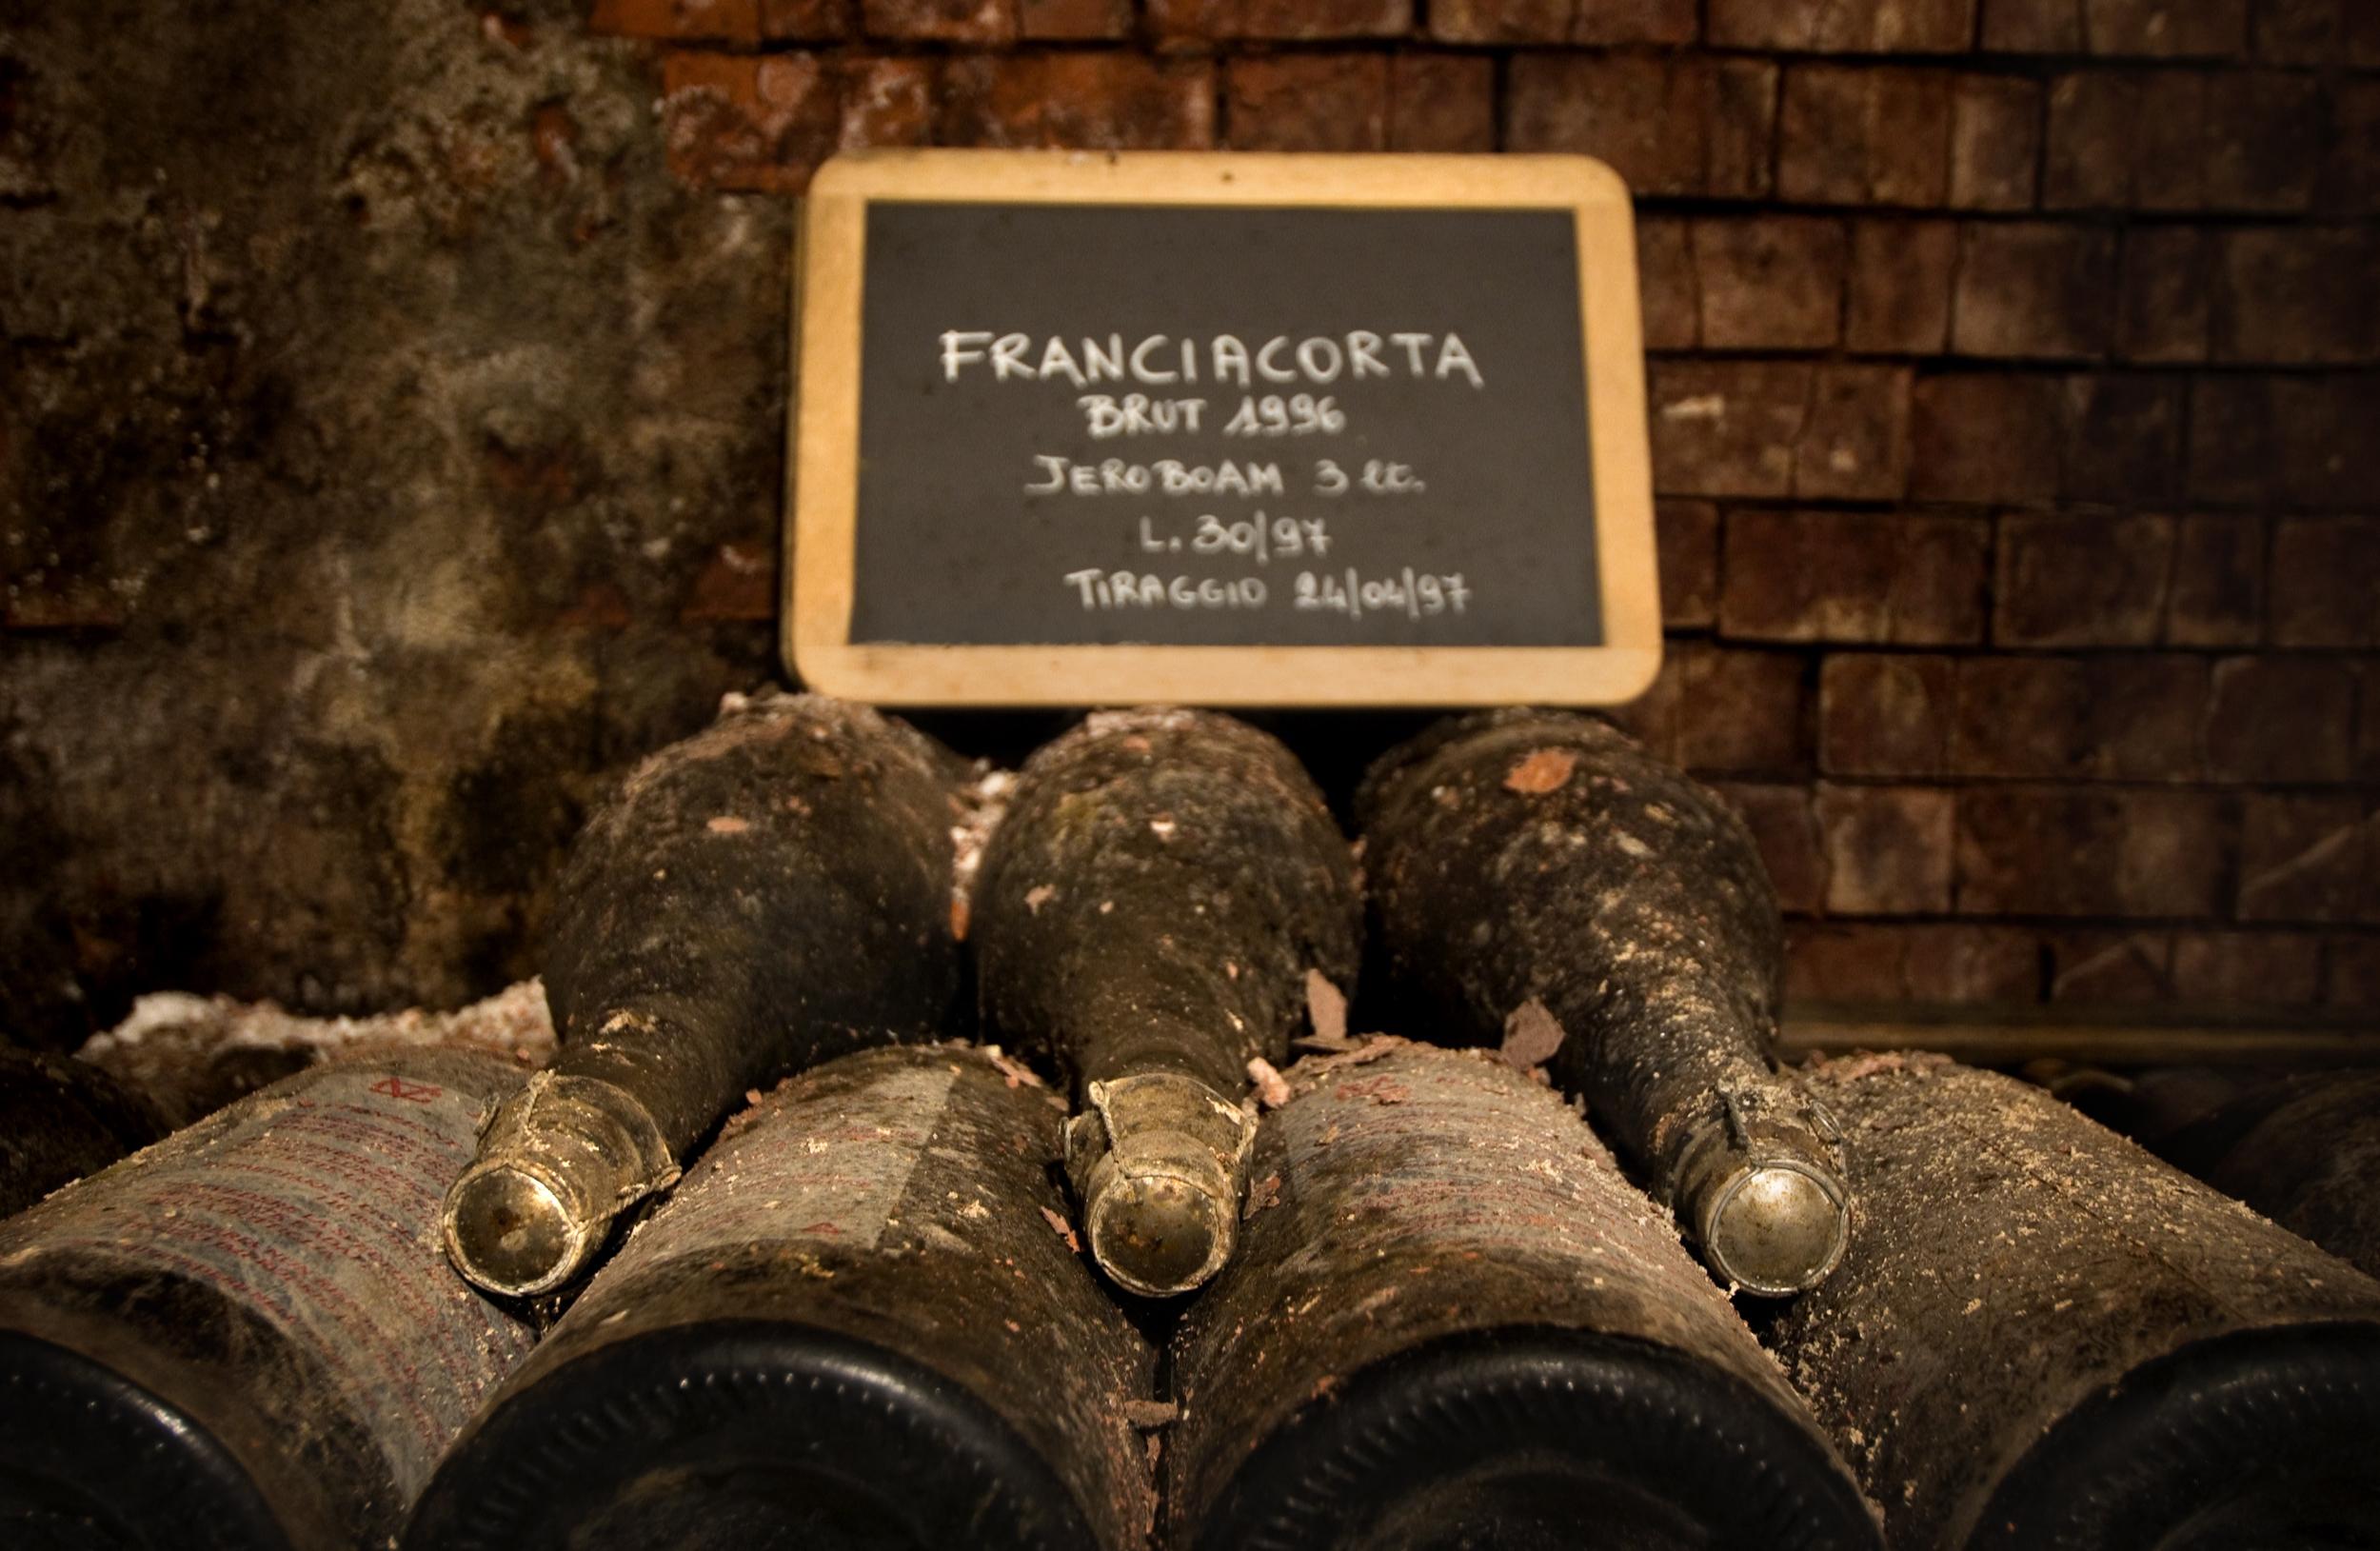 Franciacorta Brut | Photo Credit: Fabio Cattabiani